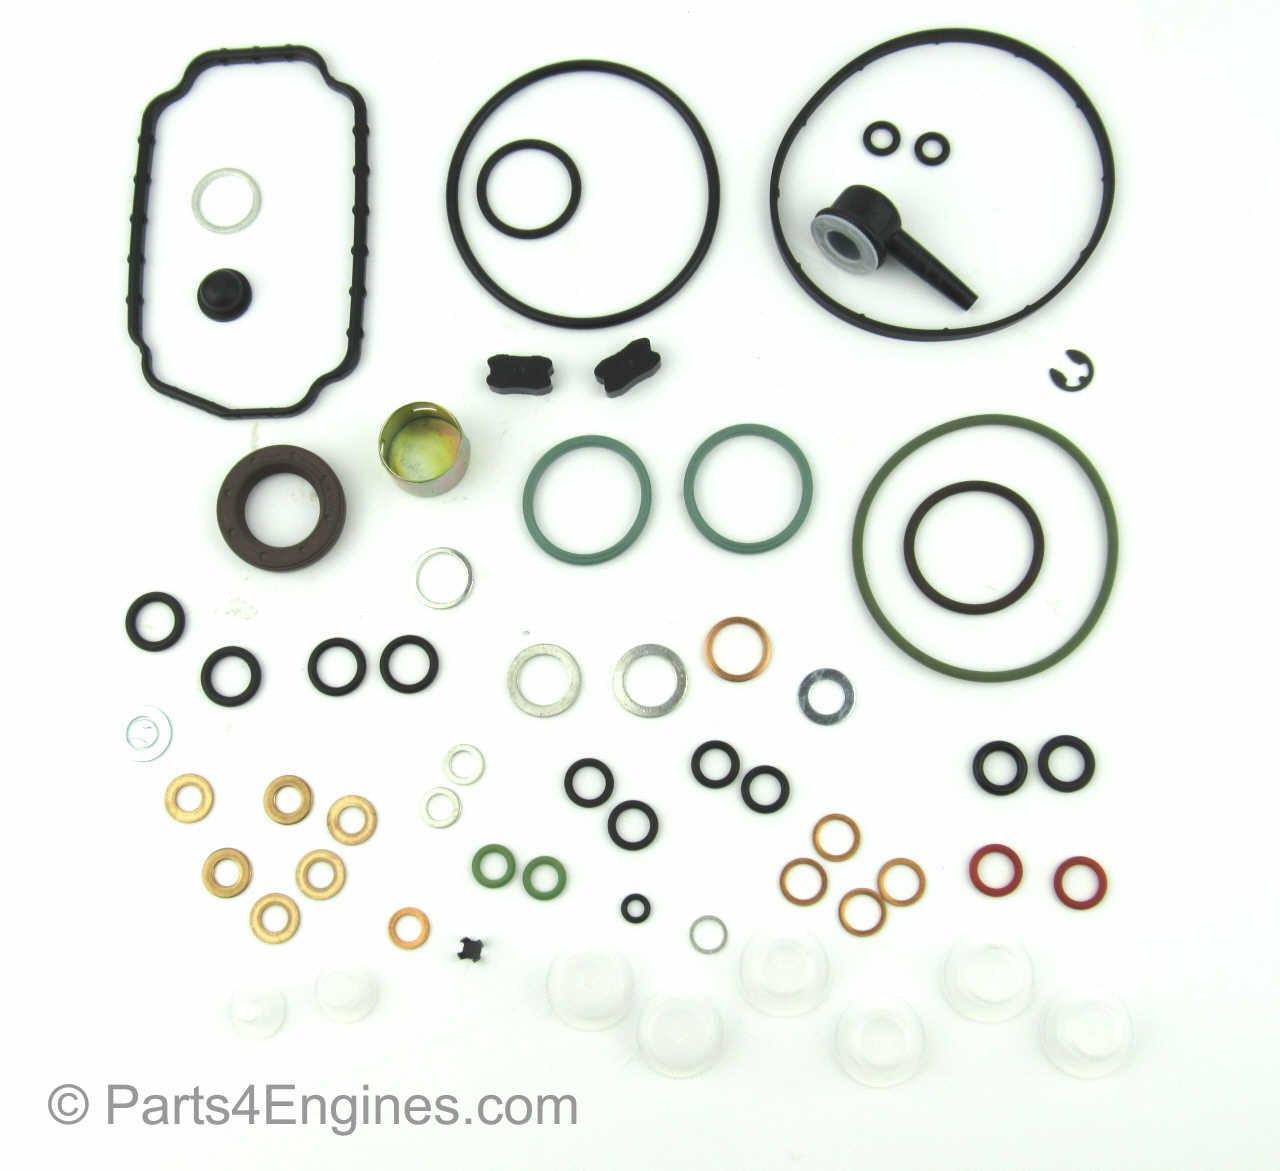 Perkins Phaser 1006 Gasket & Seal Kit for Injection Pump